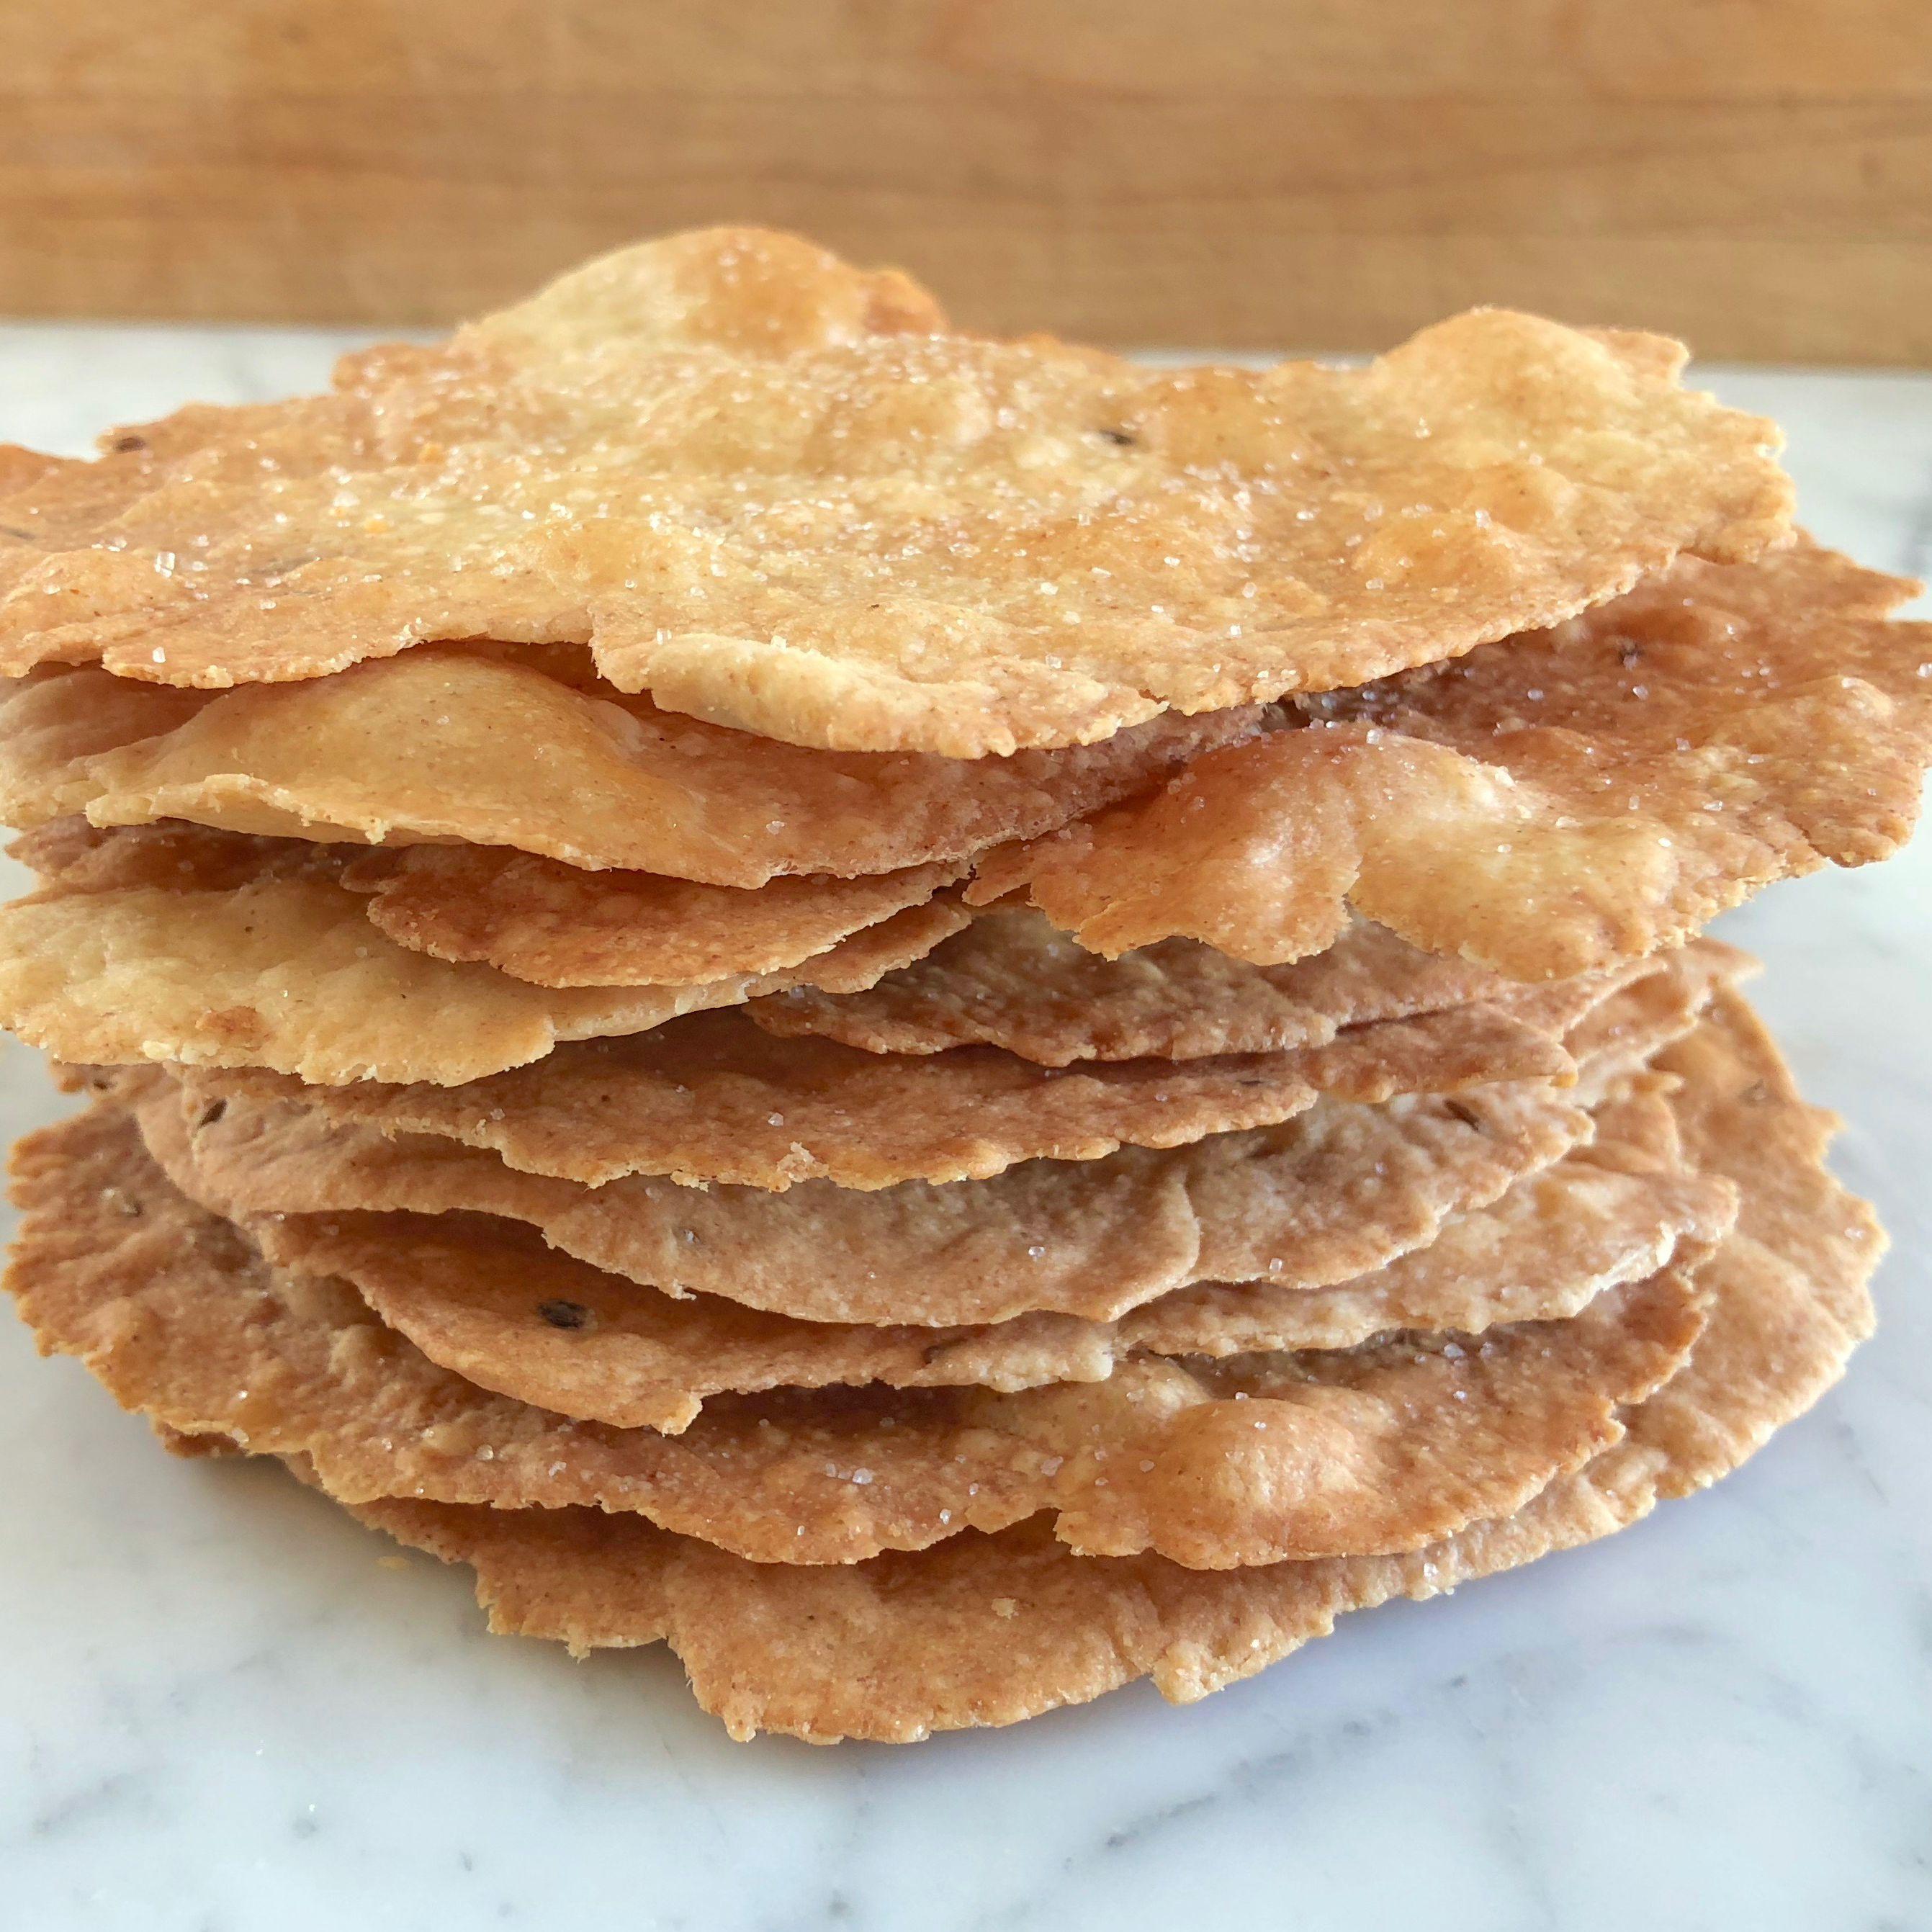 Tortas de Aceite (Spanish Olive Oil Crackers)